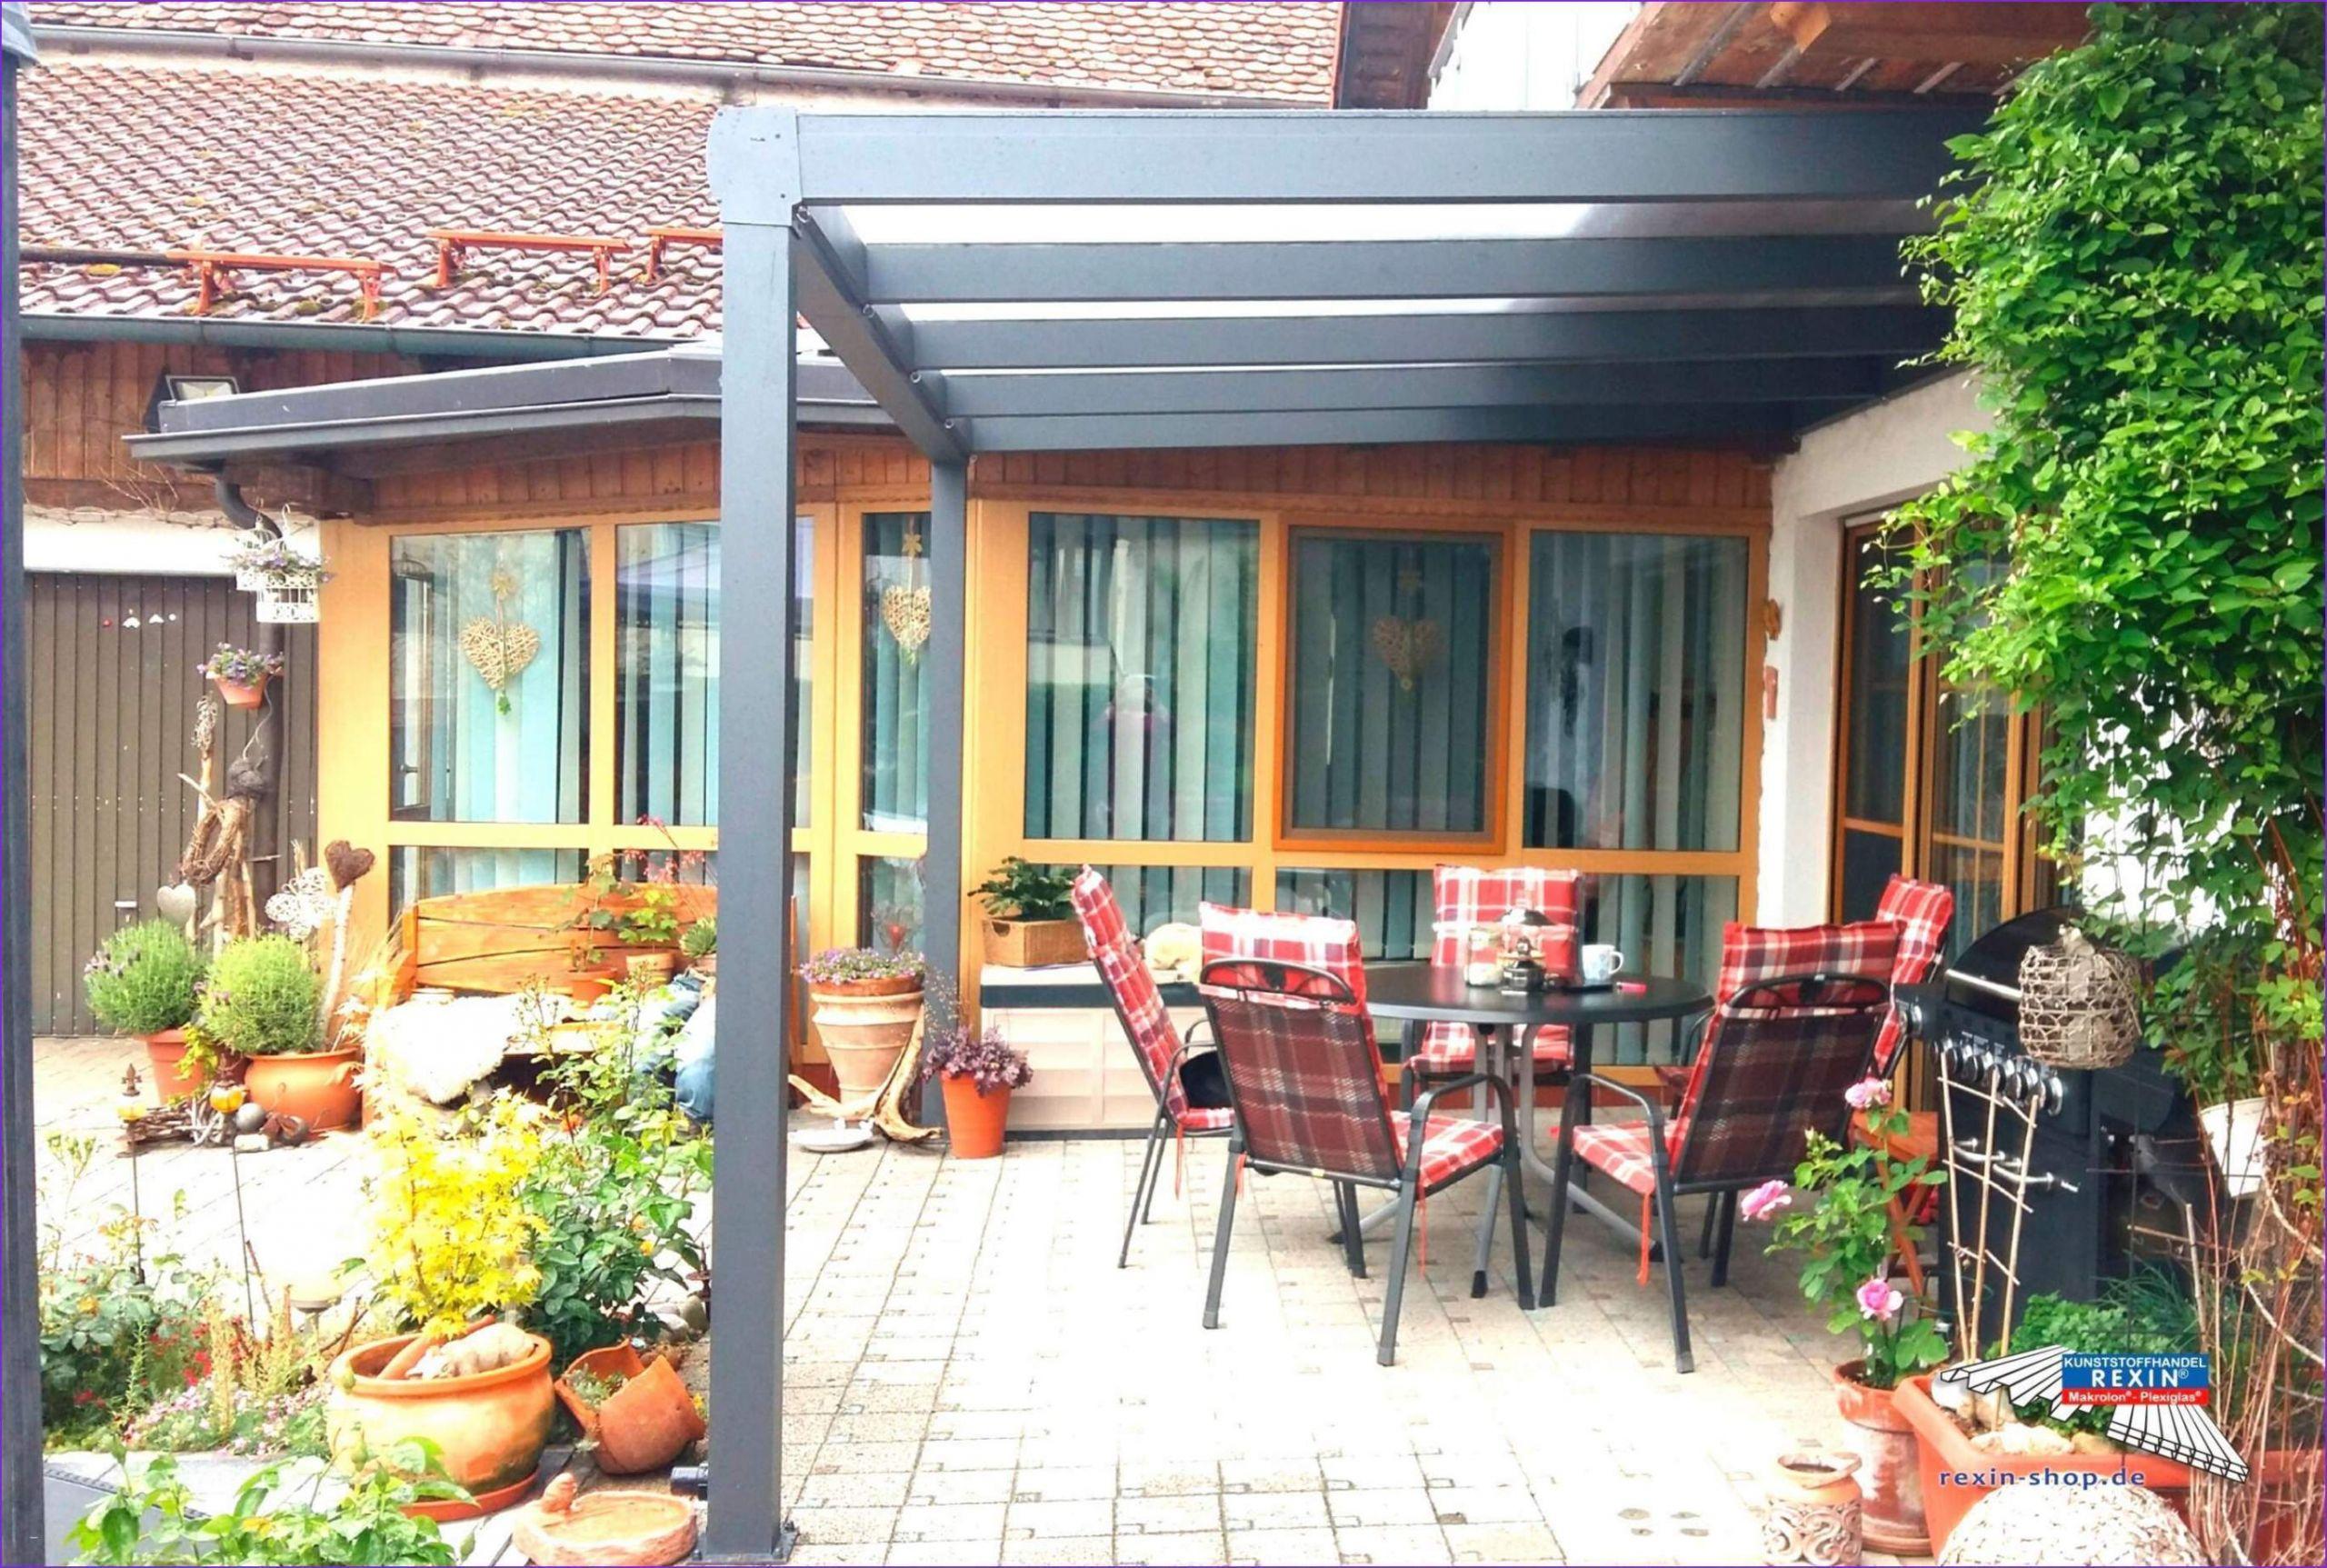 Betonwand Garten Frisch Terrasse Wand Verkleiden — Temobardz Home Blog